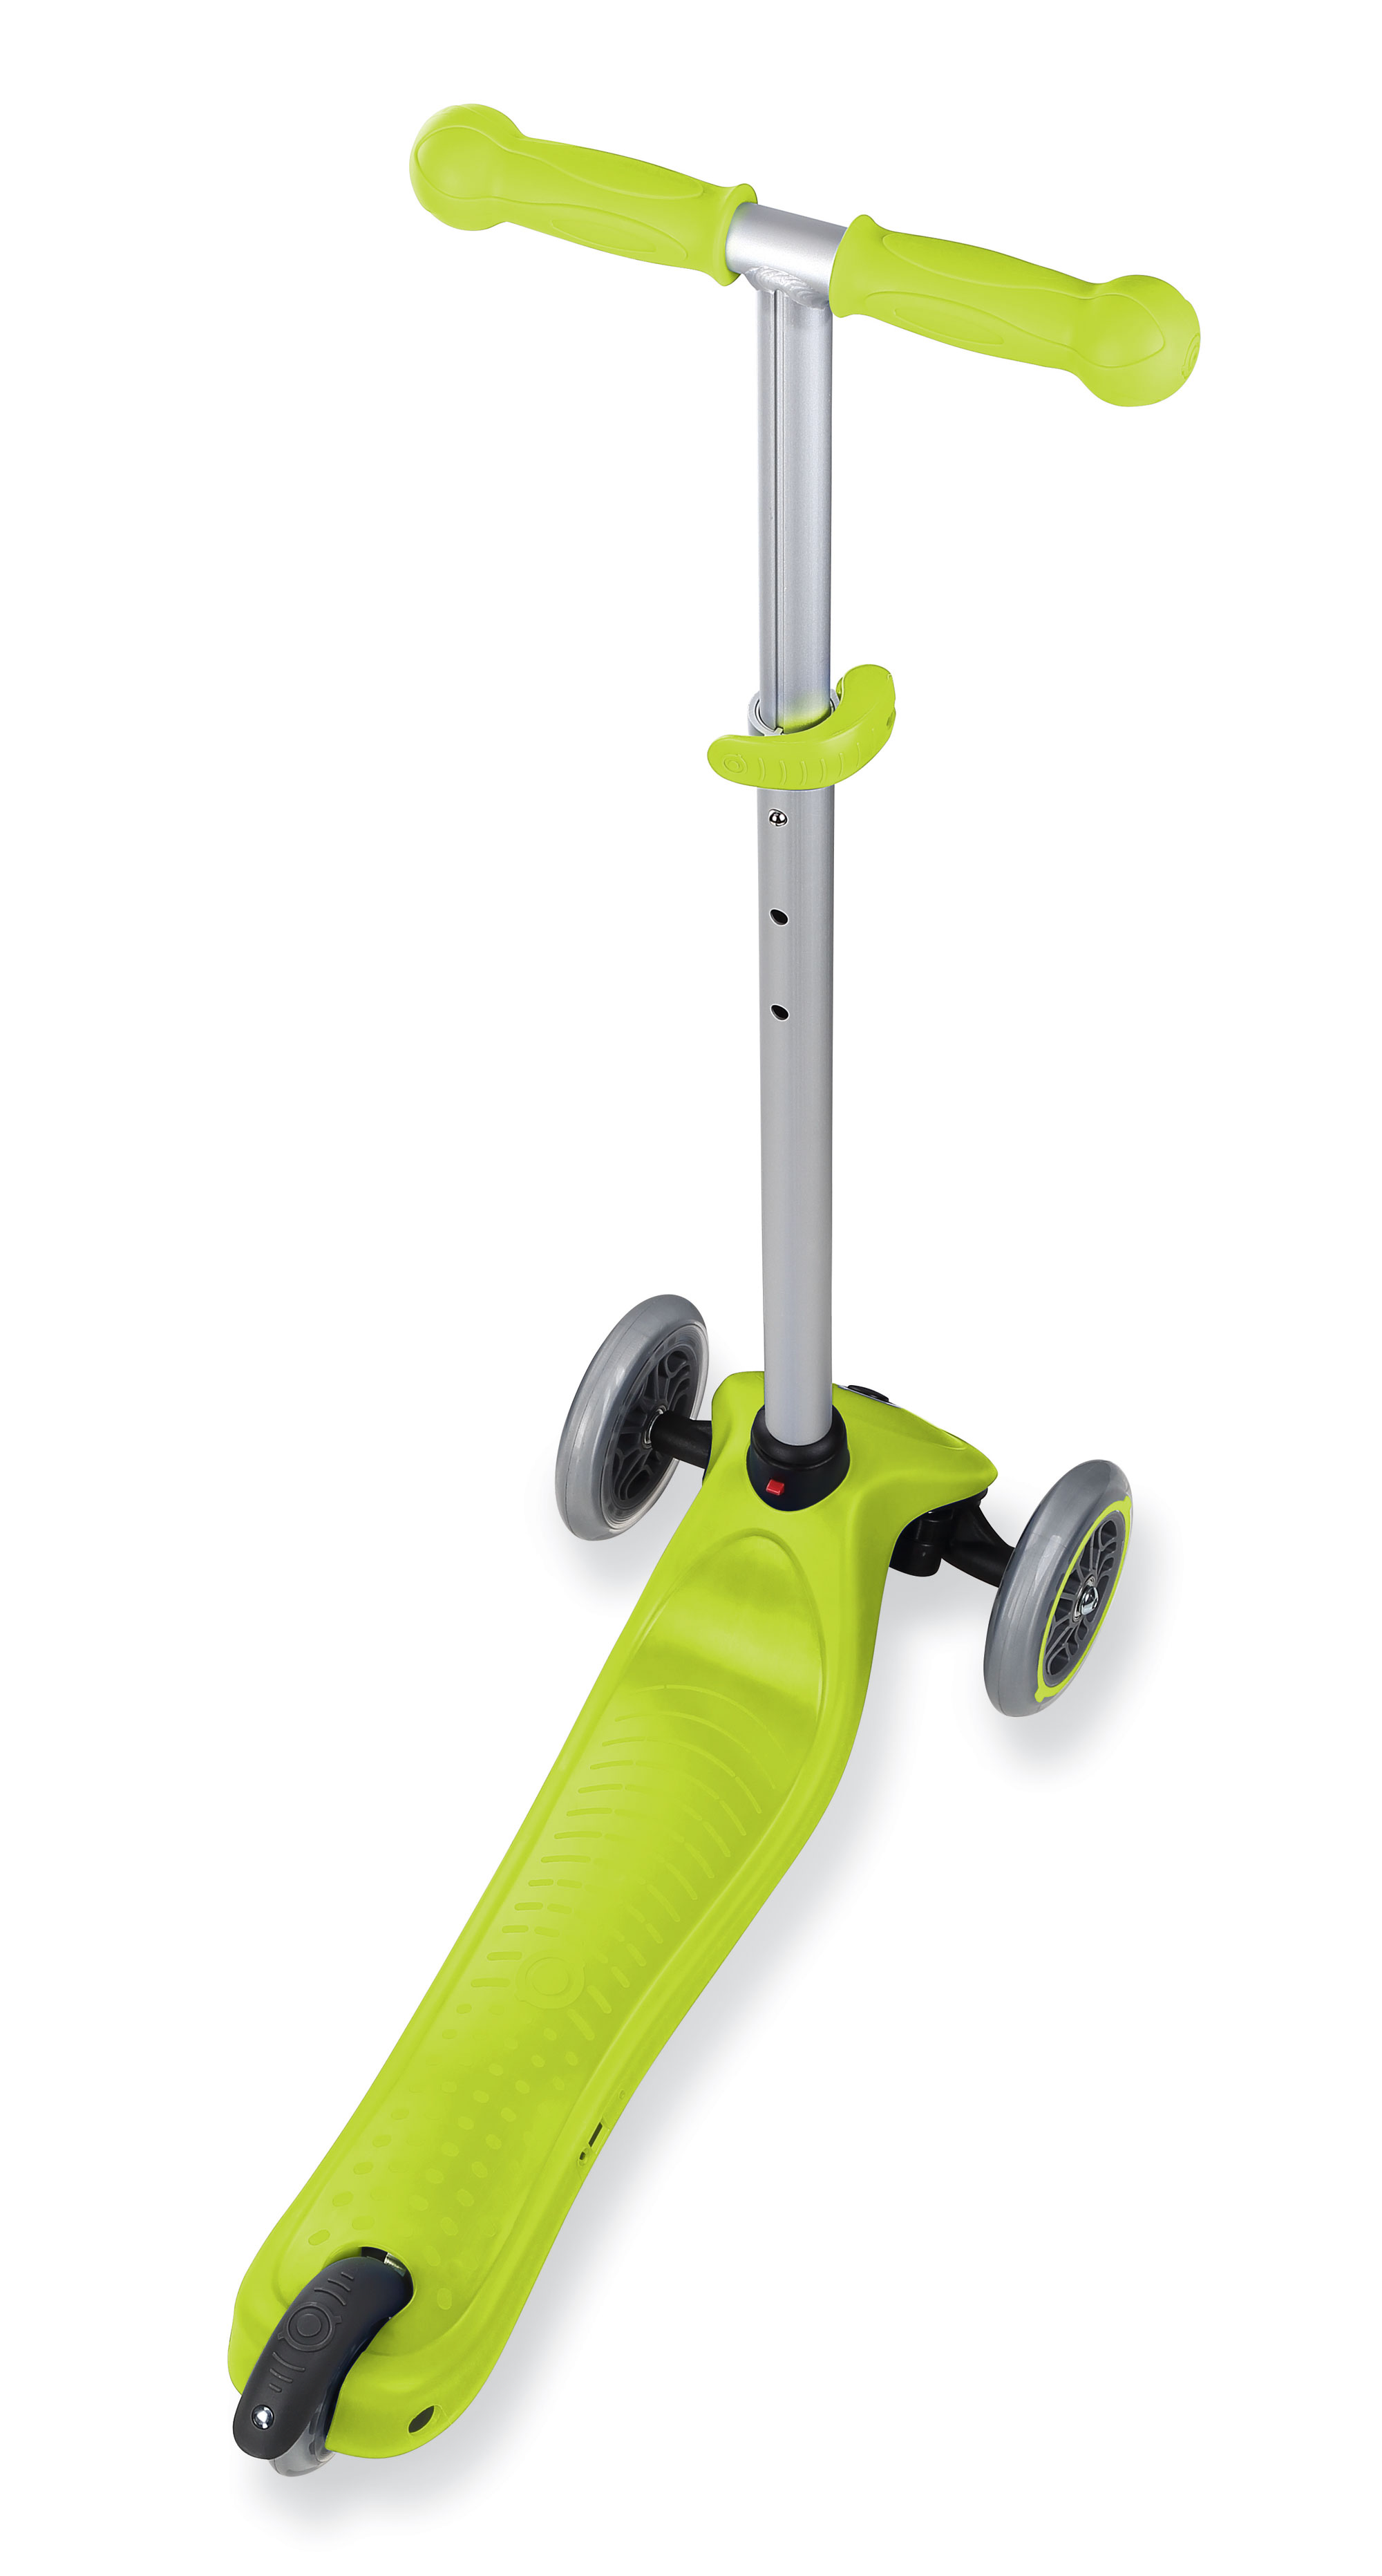 Scooter / Kinderroller / Dreirad / Laufrad Globber Evo 4in1 grün Set Bild 6